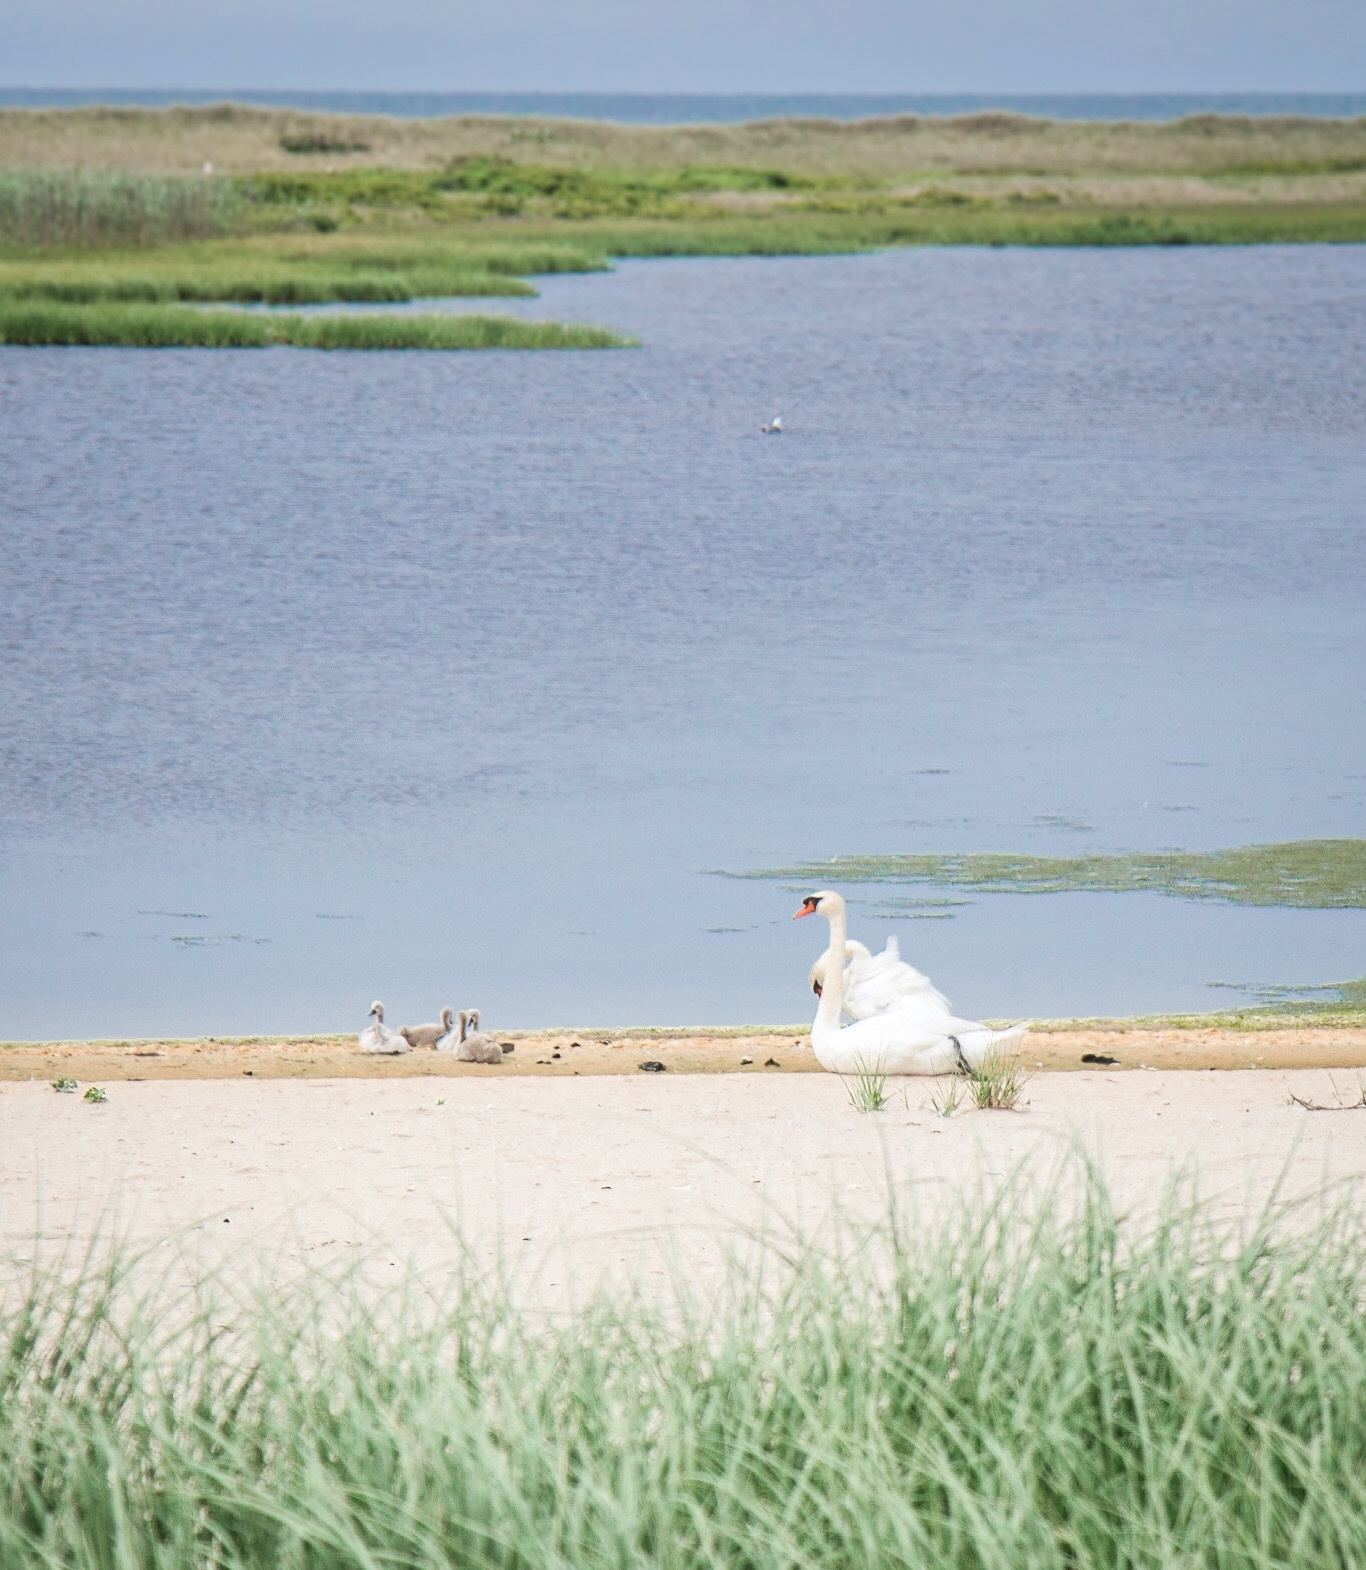 Coskata+Coatue+Wildlife+Refuge_Nantucket+Island+Massachusetts_Swan+%2B+Cygnet